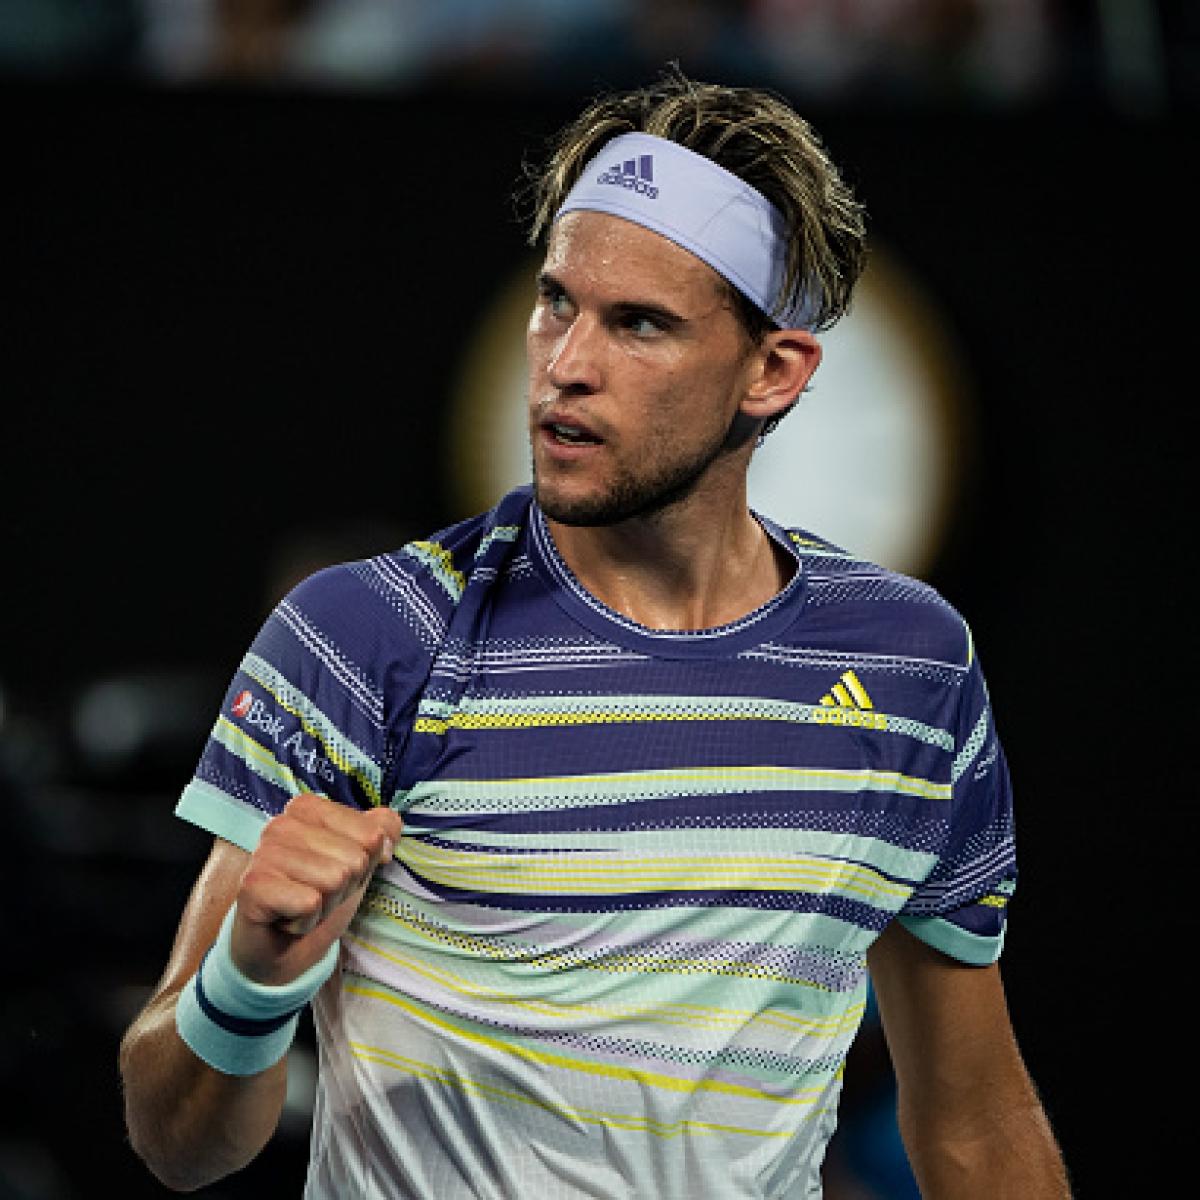 Dominic Thiem storms into final with 'king of Australia' Djokovic